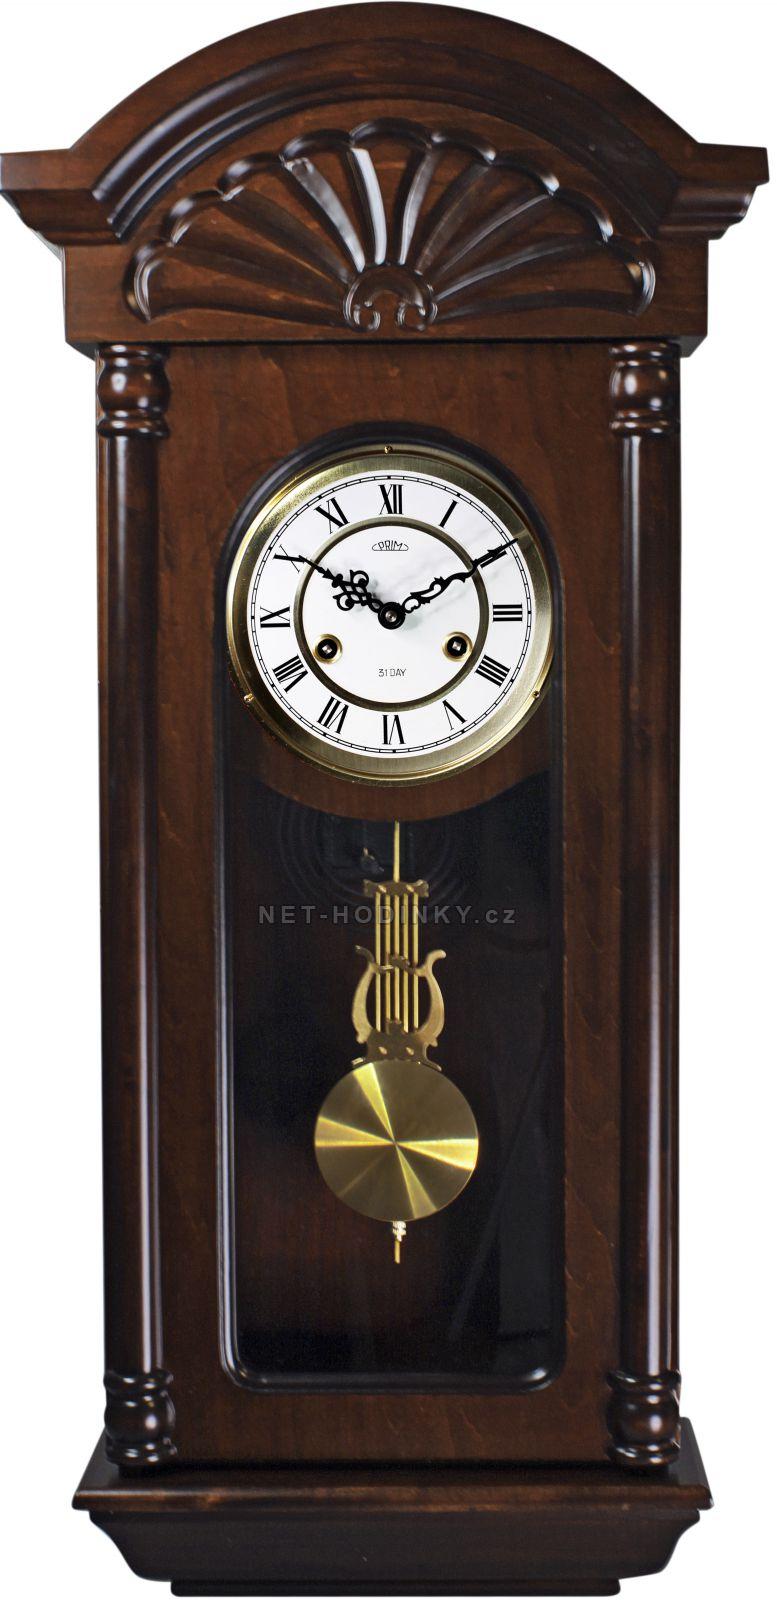 Mechanické kyvadlové hodiny PRIM 54 - tmavé dřevo